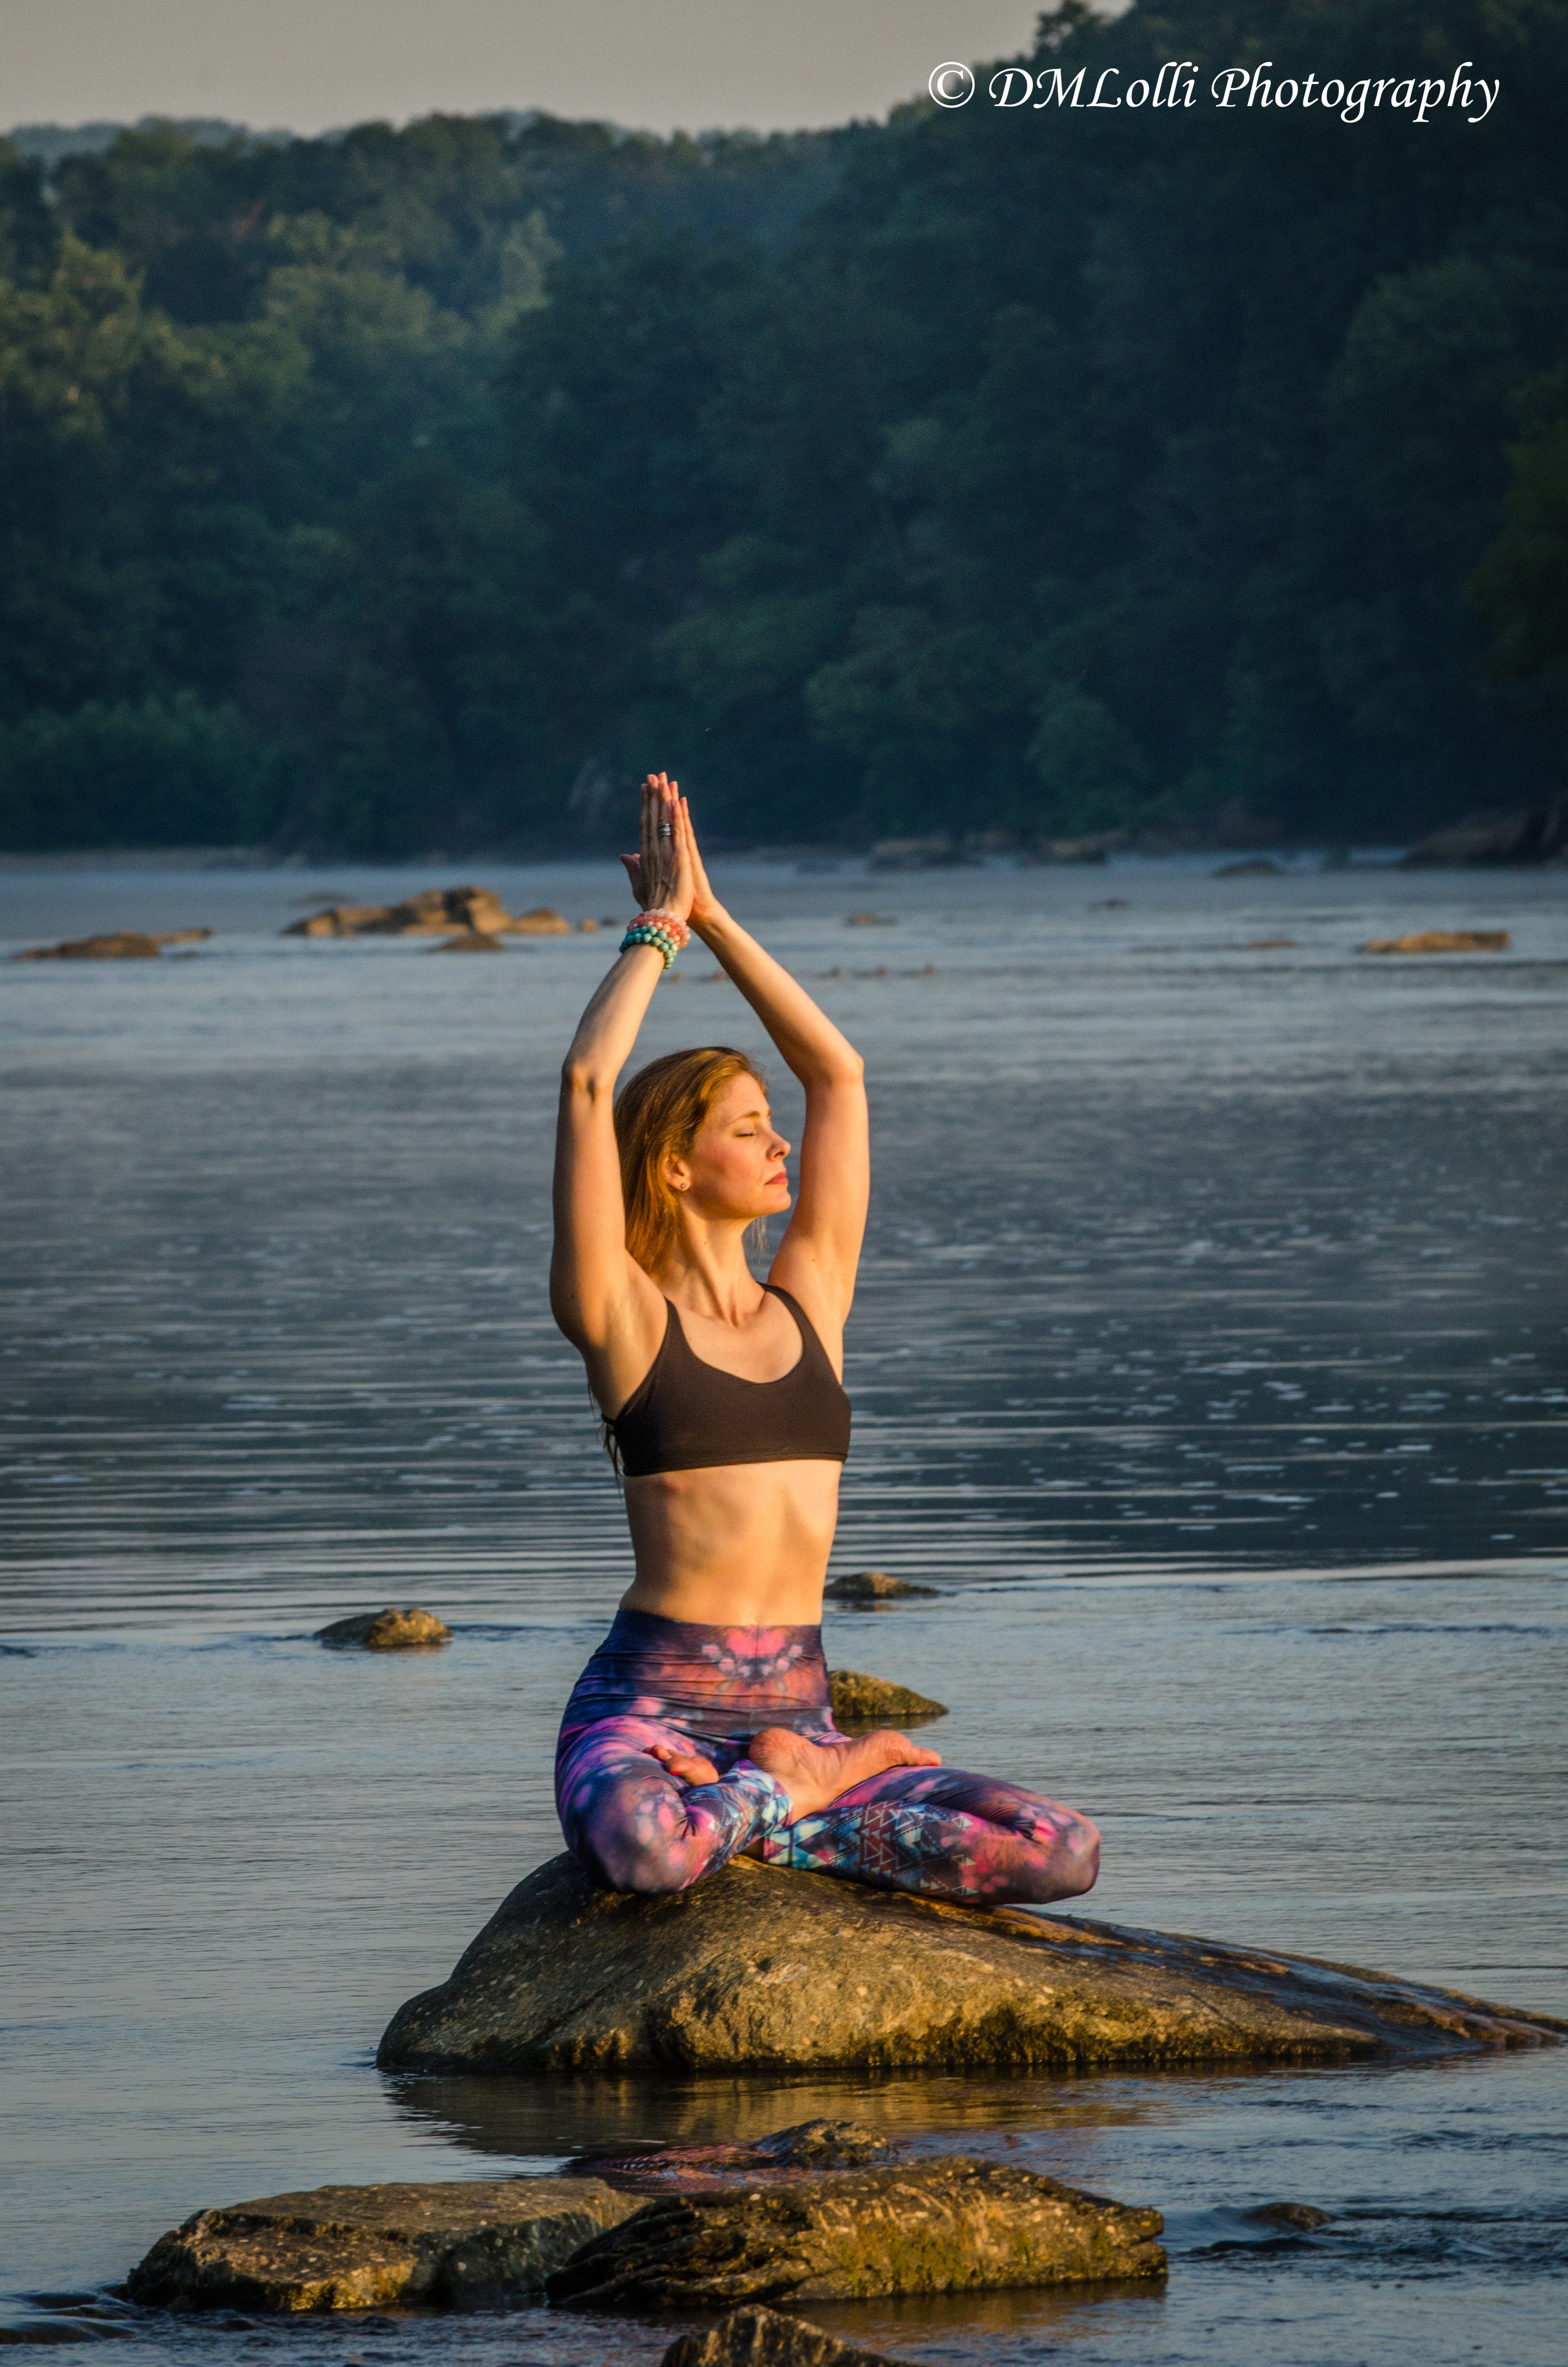 Parry Dale, Vinyasa teacher at Easy Day Yoga in Ashburn, Va., practicing in nature.